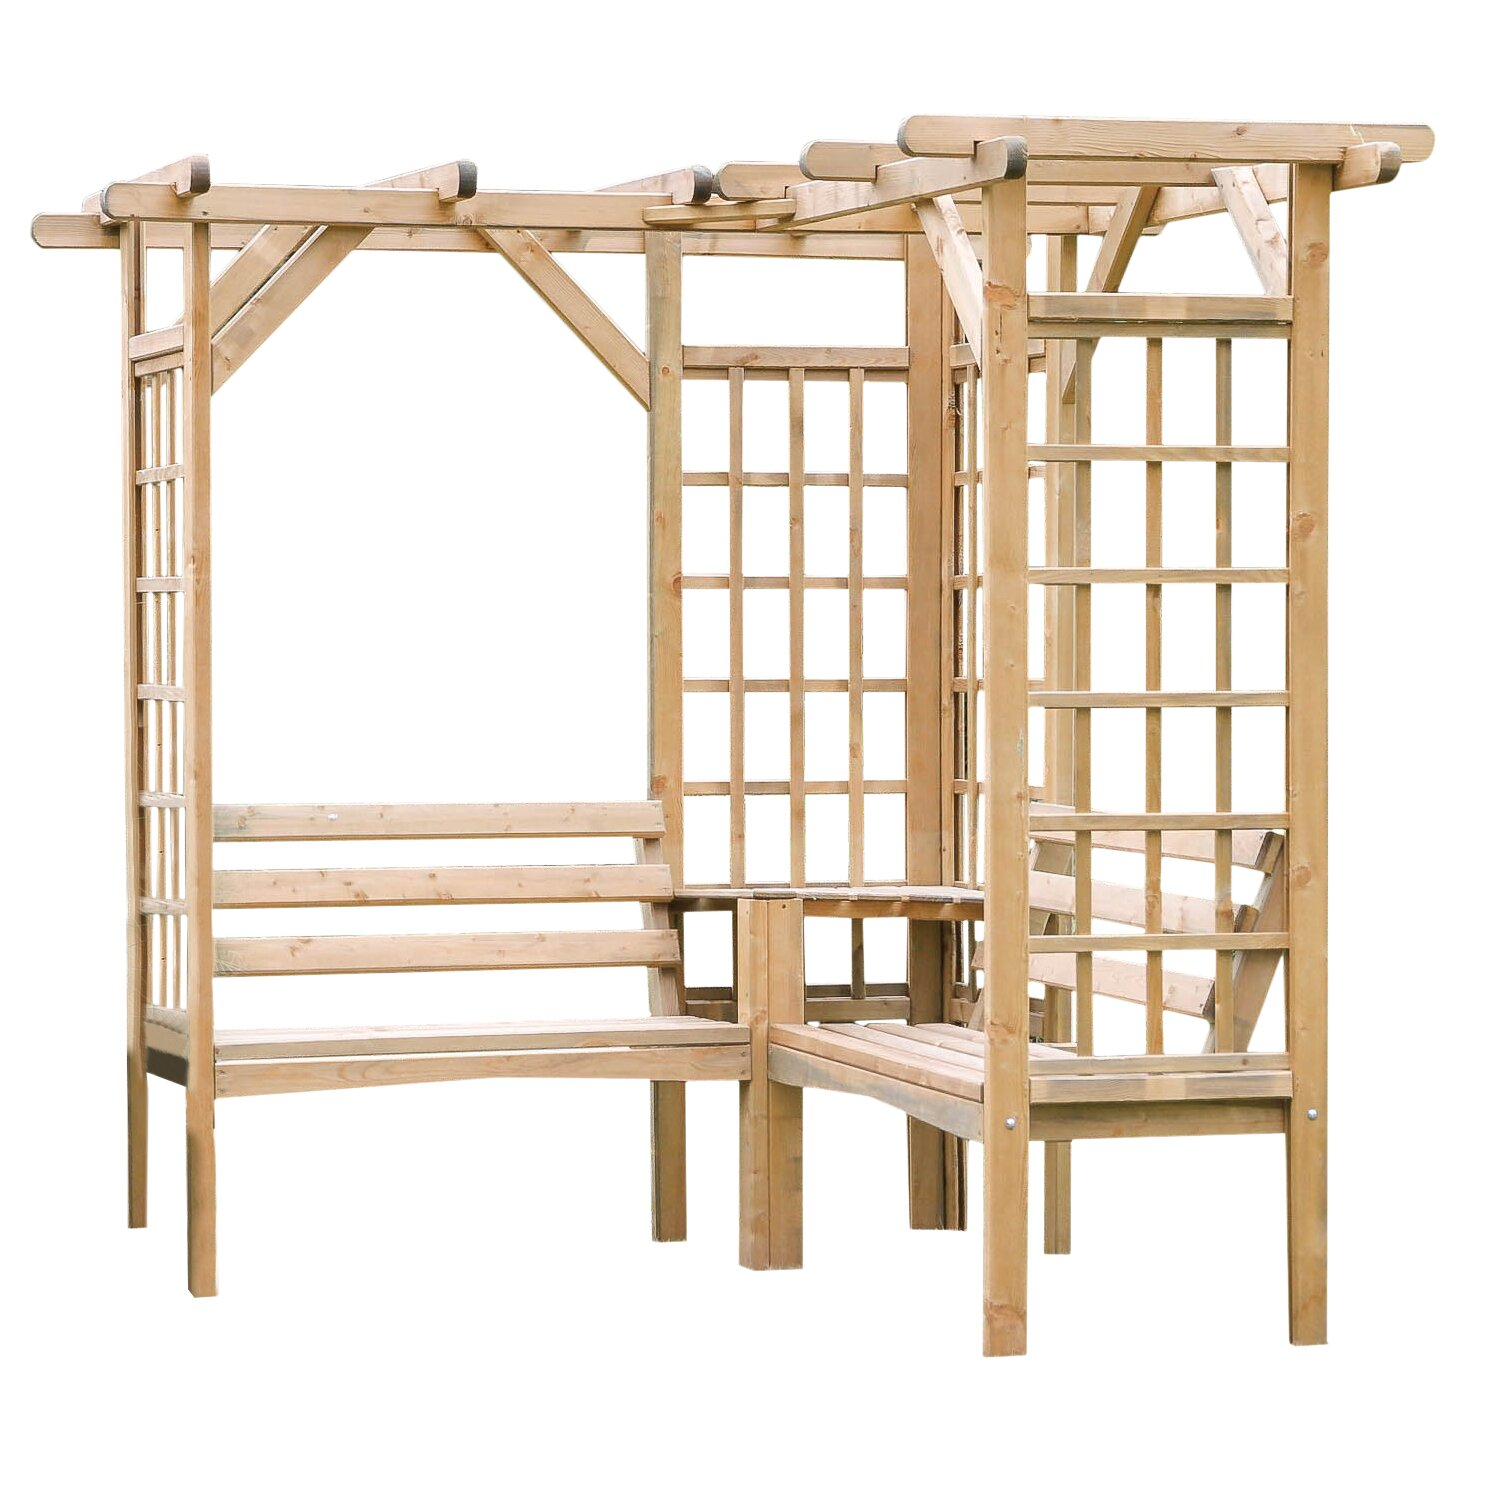 zest 4 leisure rosenbogen mit bank bewertungen. Black Bedroom Furniture Sets. Home Design Ideas